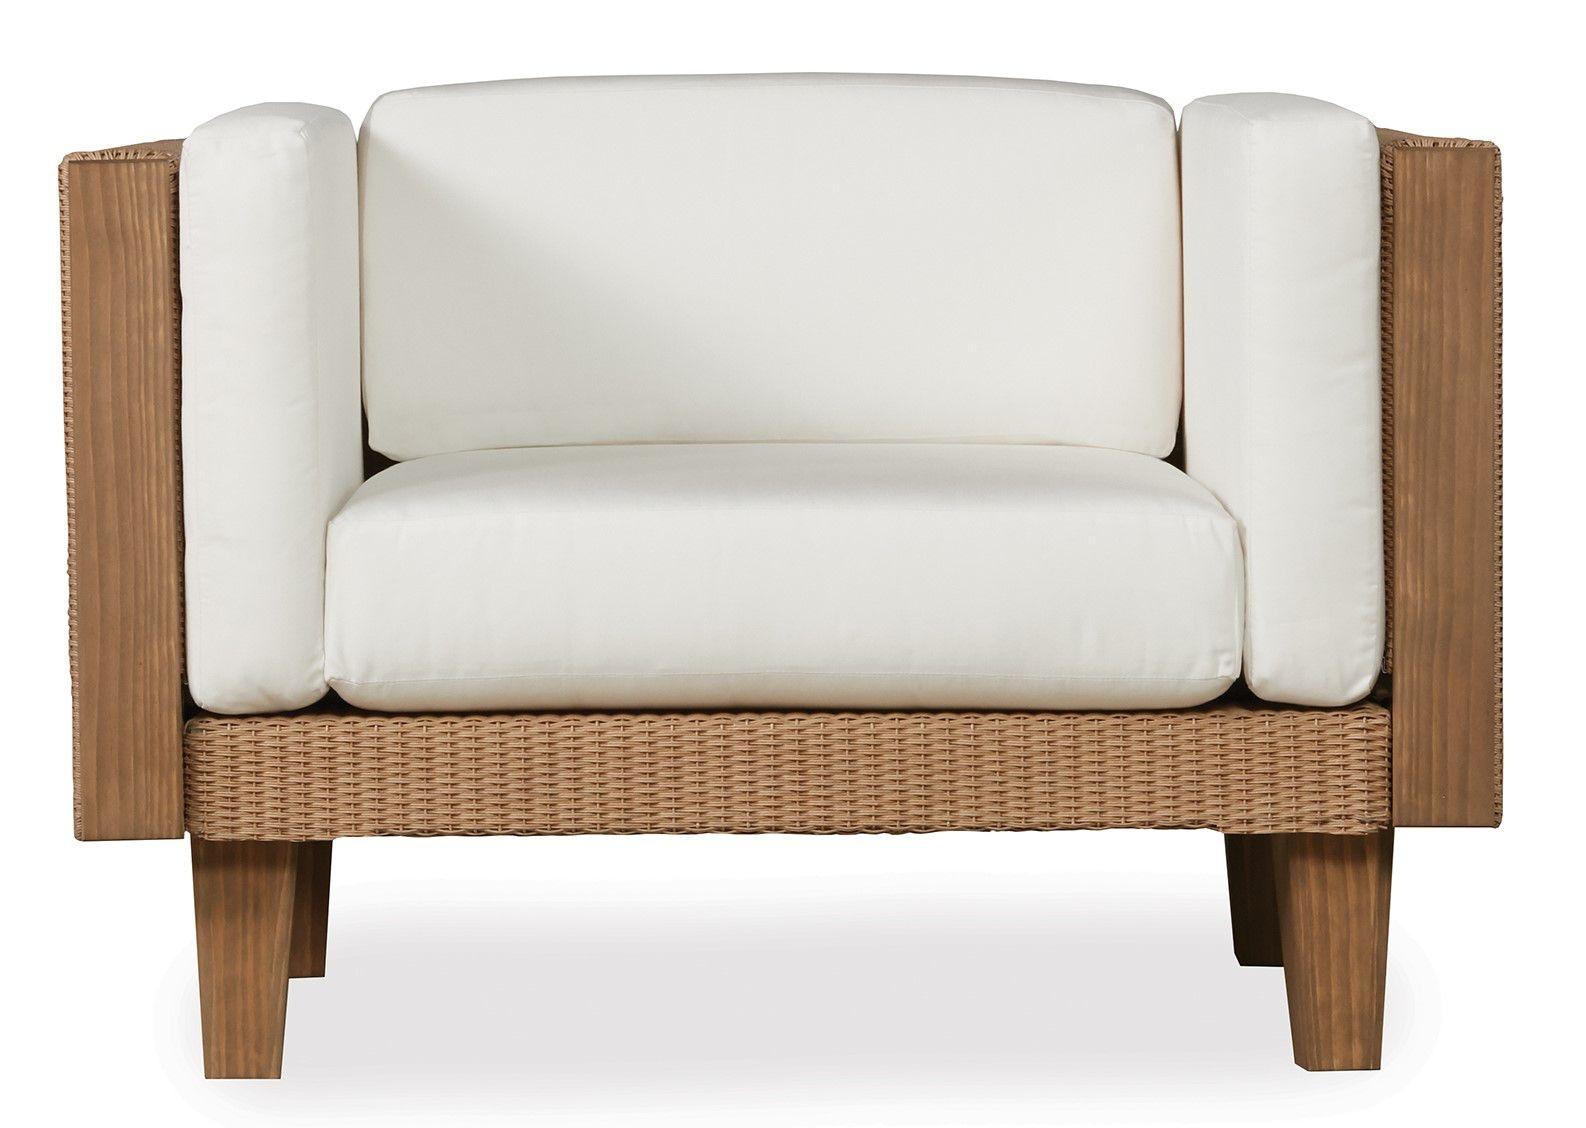 Lloyd Flanders Catalina Lounge Chair 144002